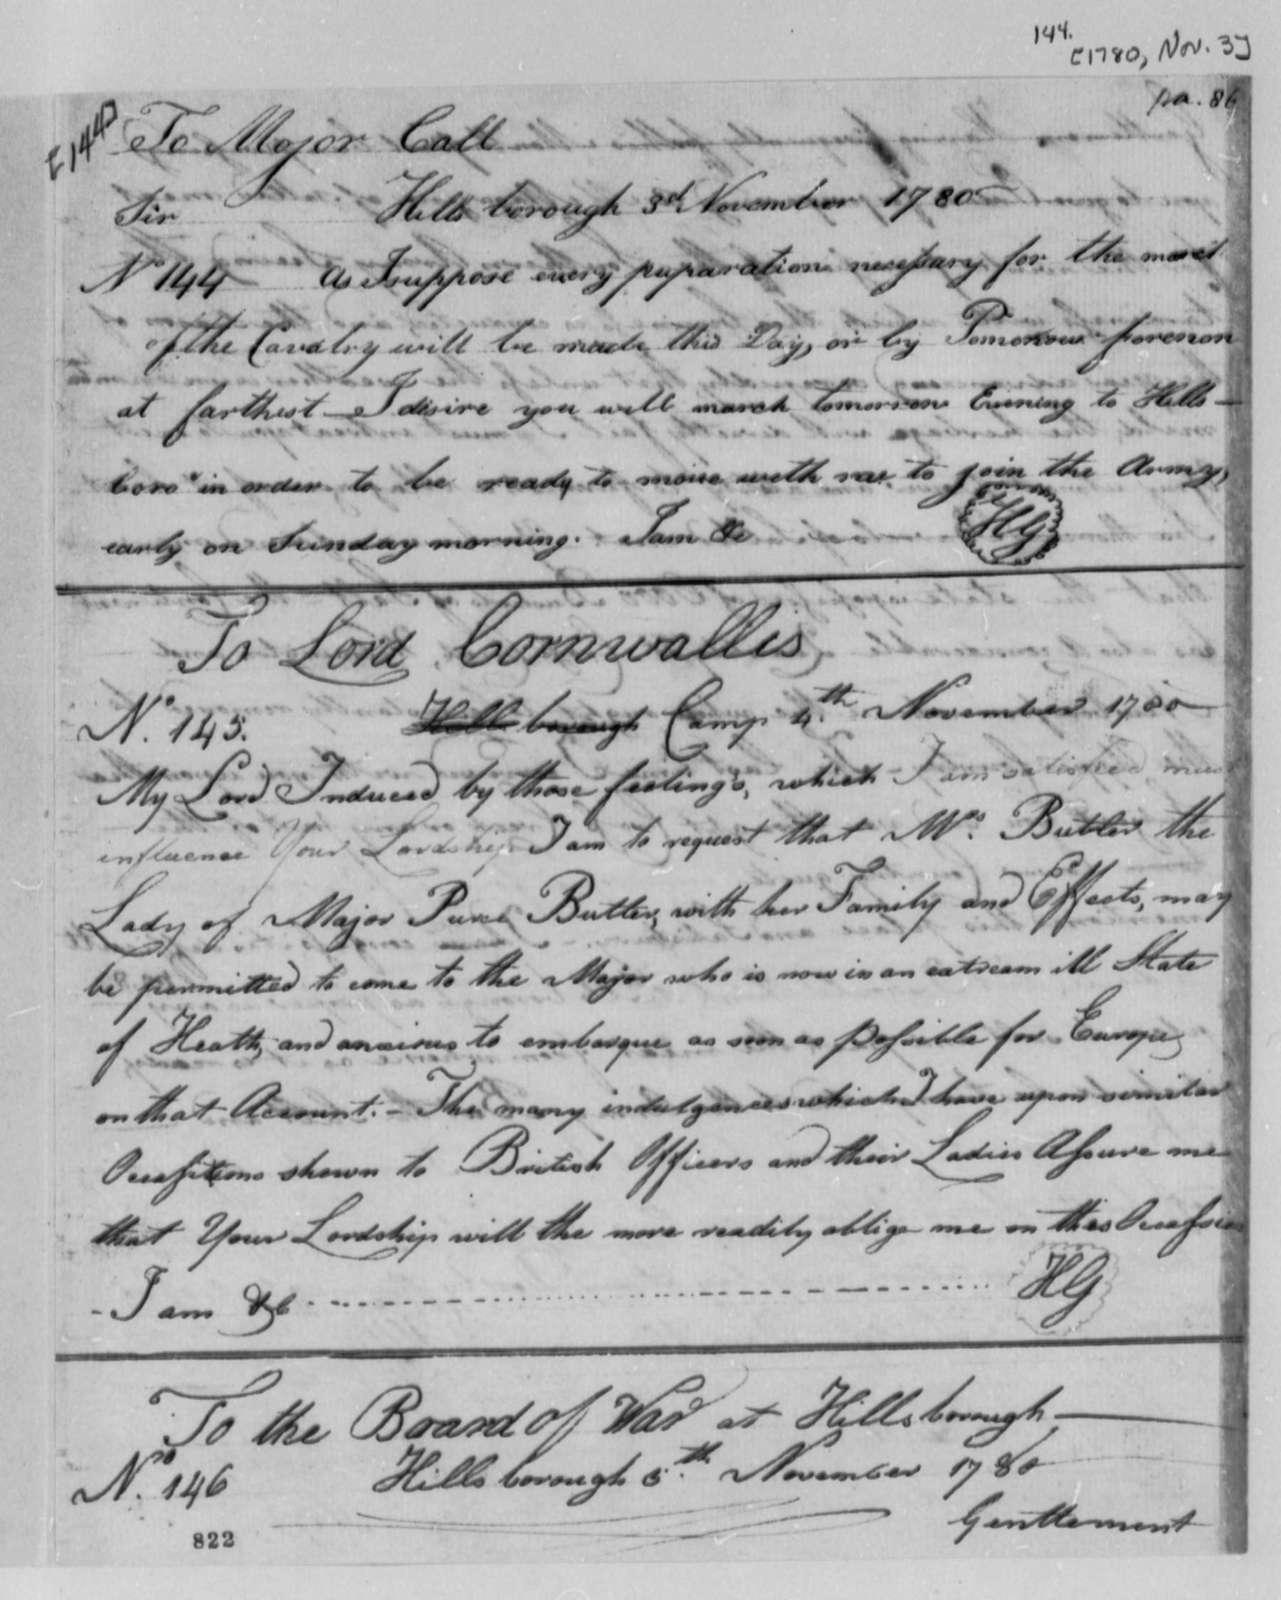 Horatio Gates to Richard K. Call, November 3, 1780